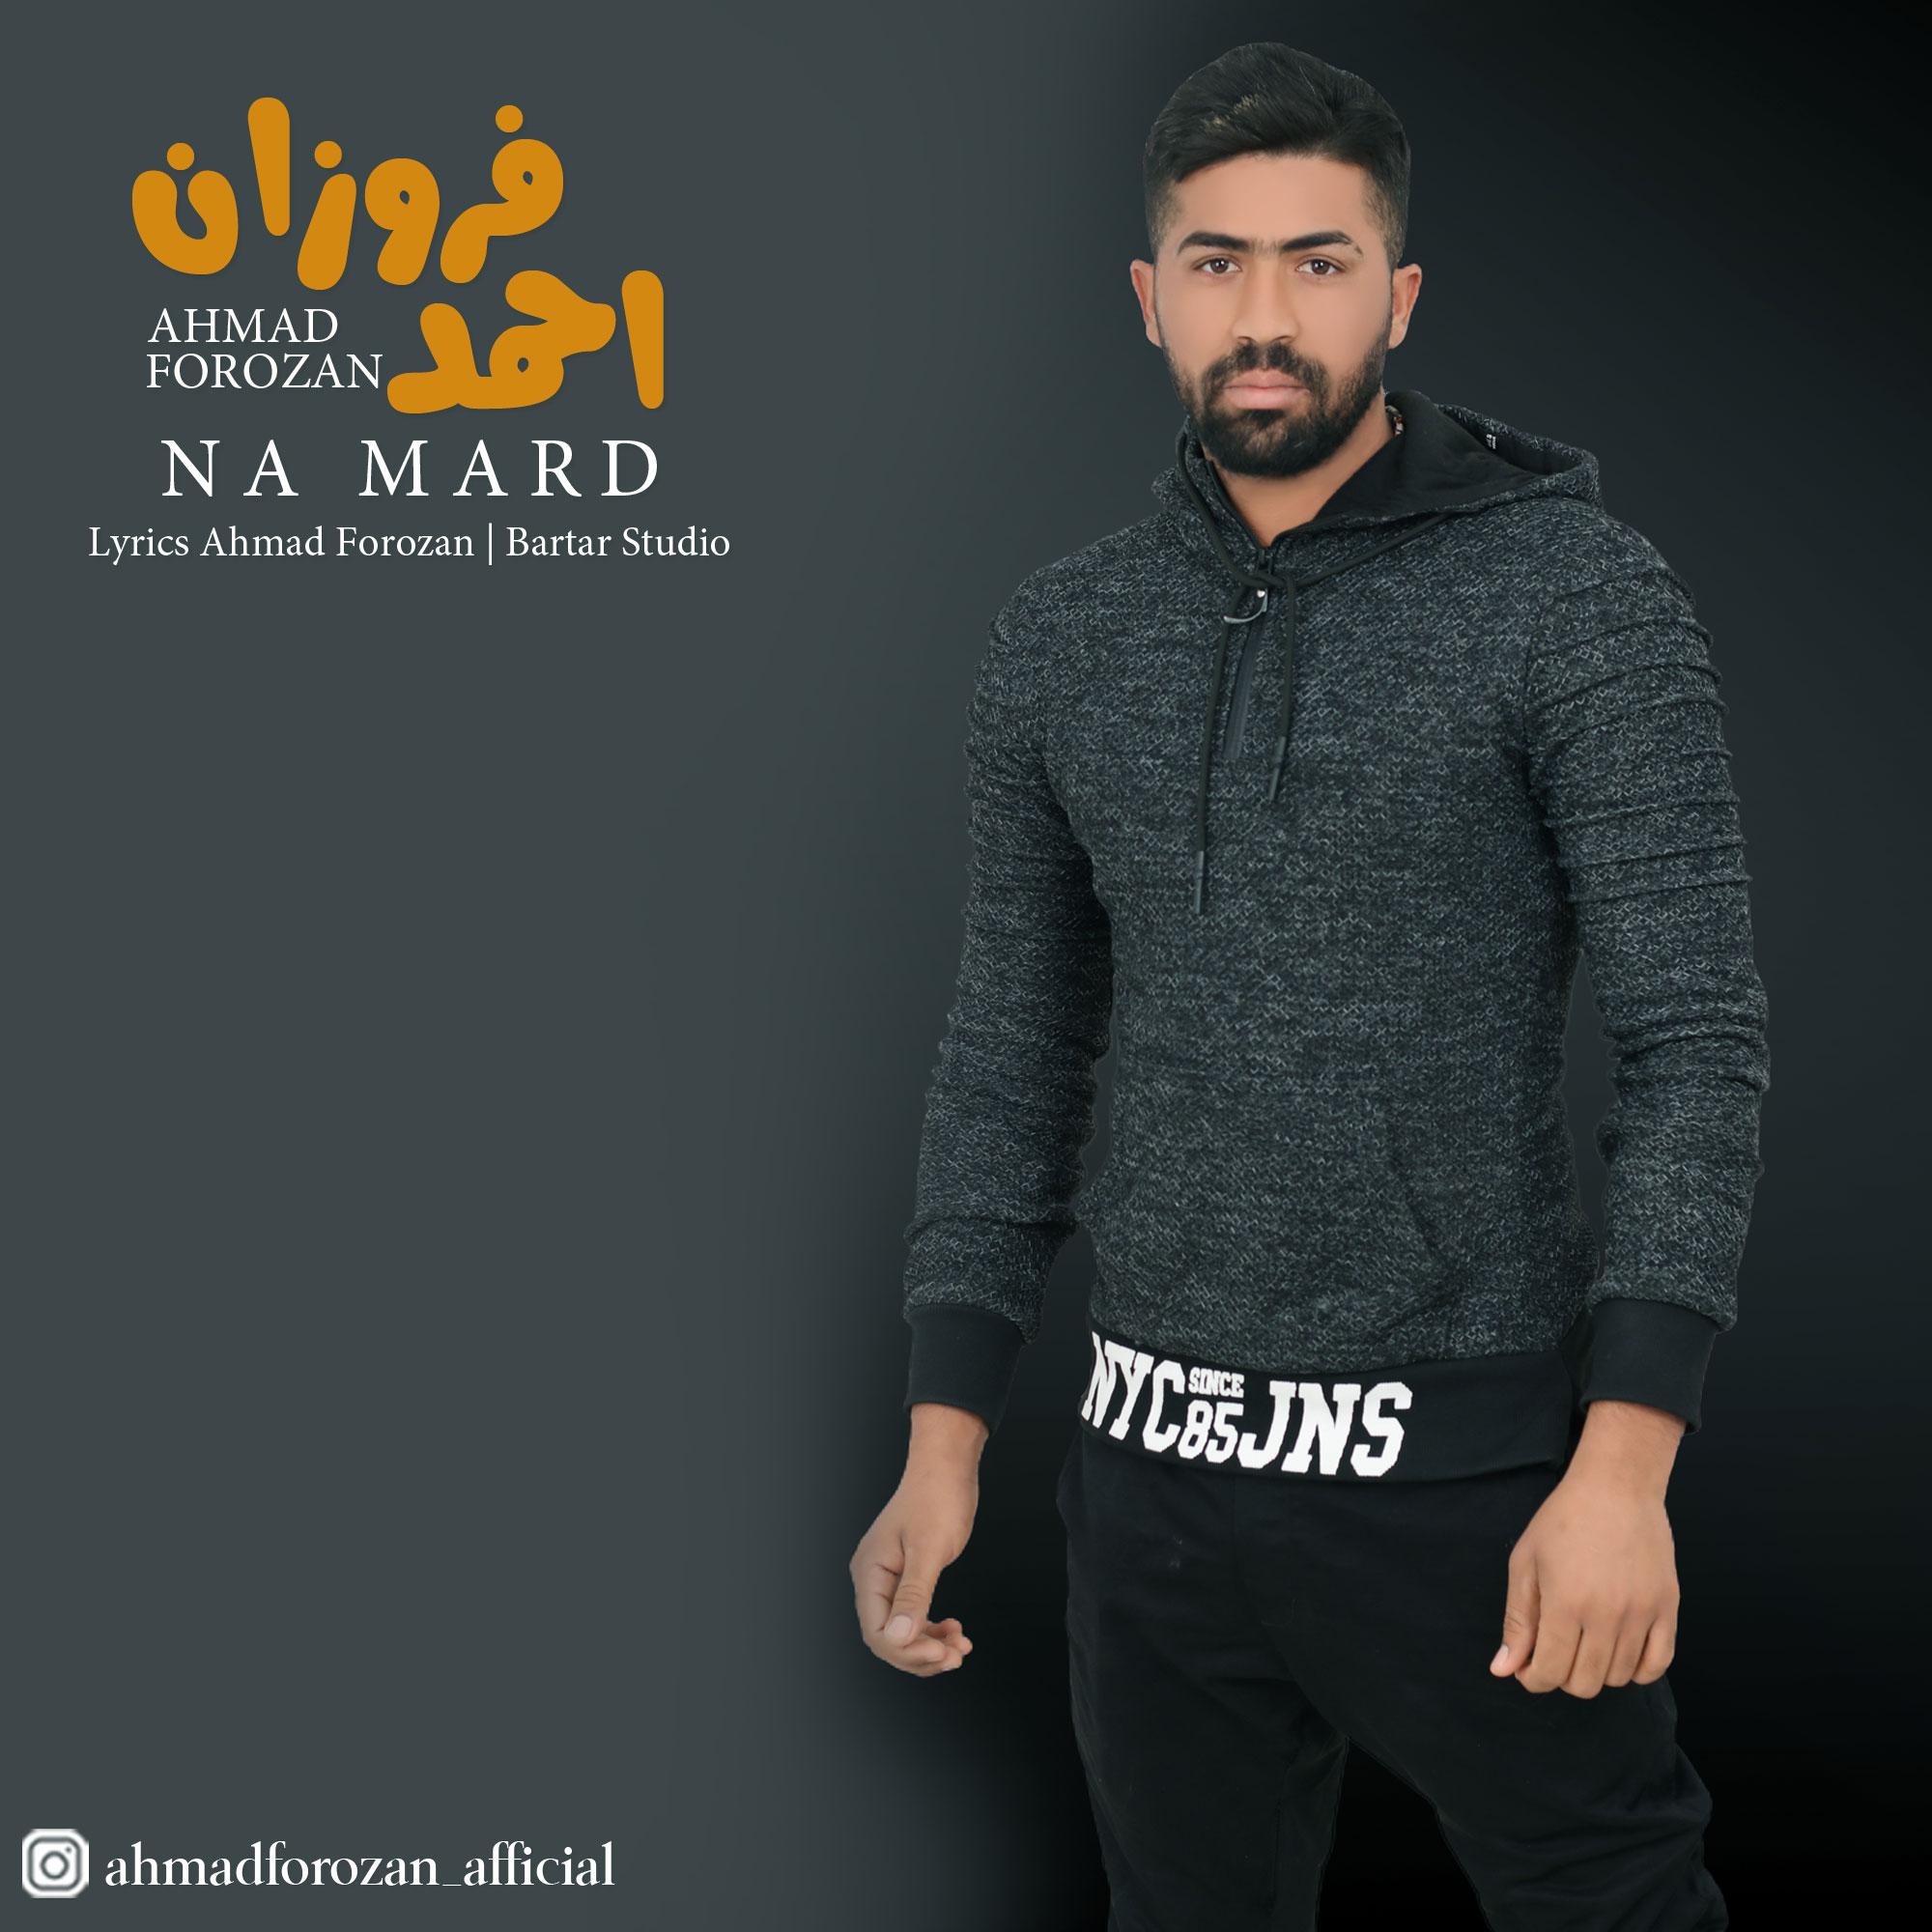 Ahmad Forozan – Na Mard